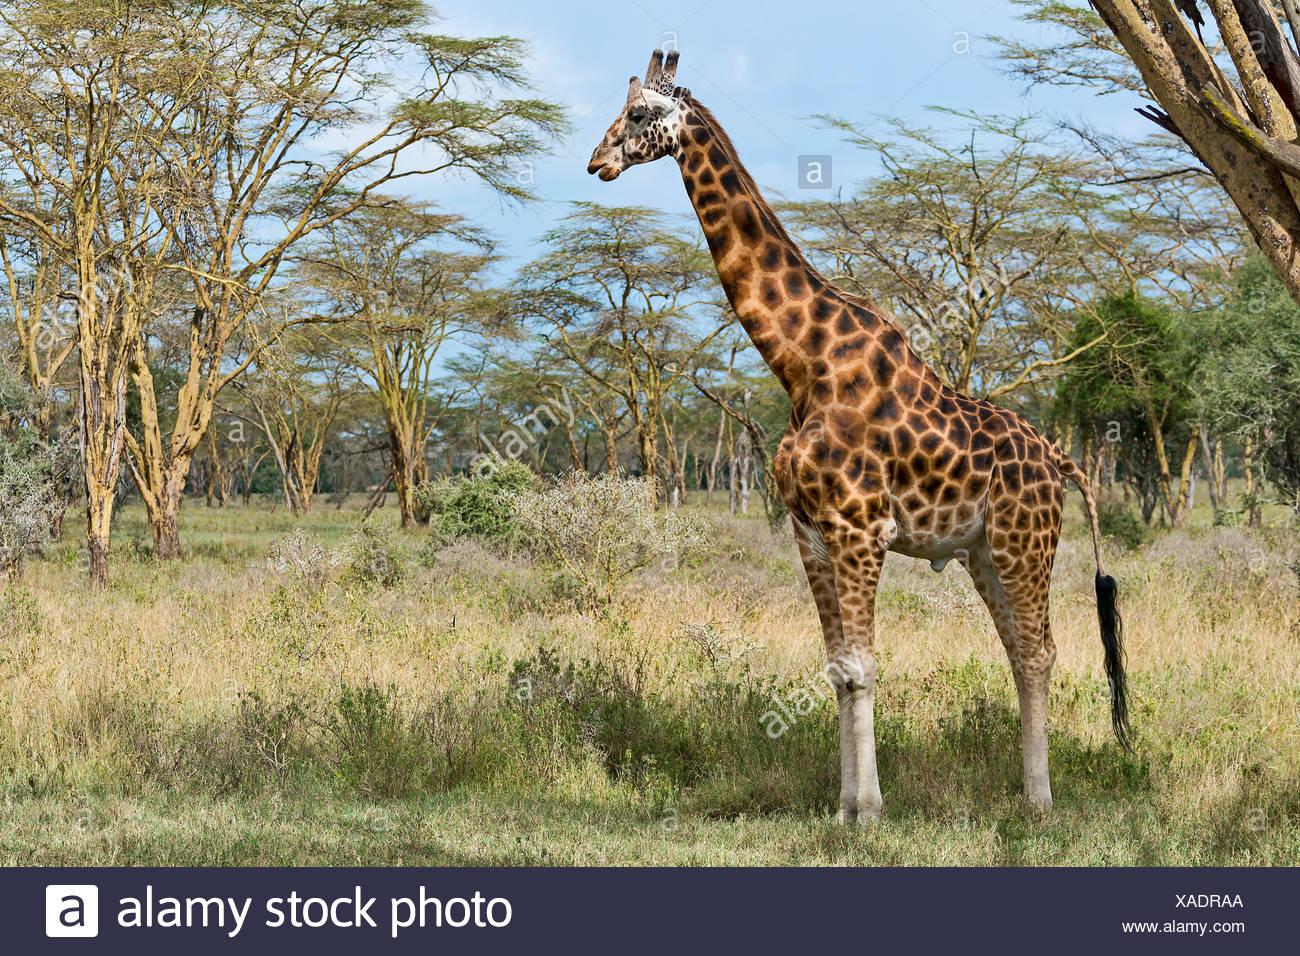 Rothschild's giraffe (Giraffa camelopardalis camelopardis) in bushland, Lake Nakuru National Park, Kenya - Stock Image